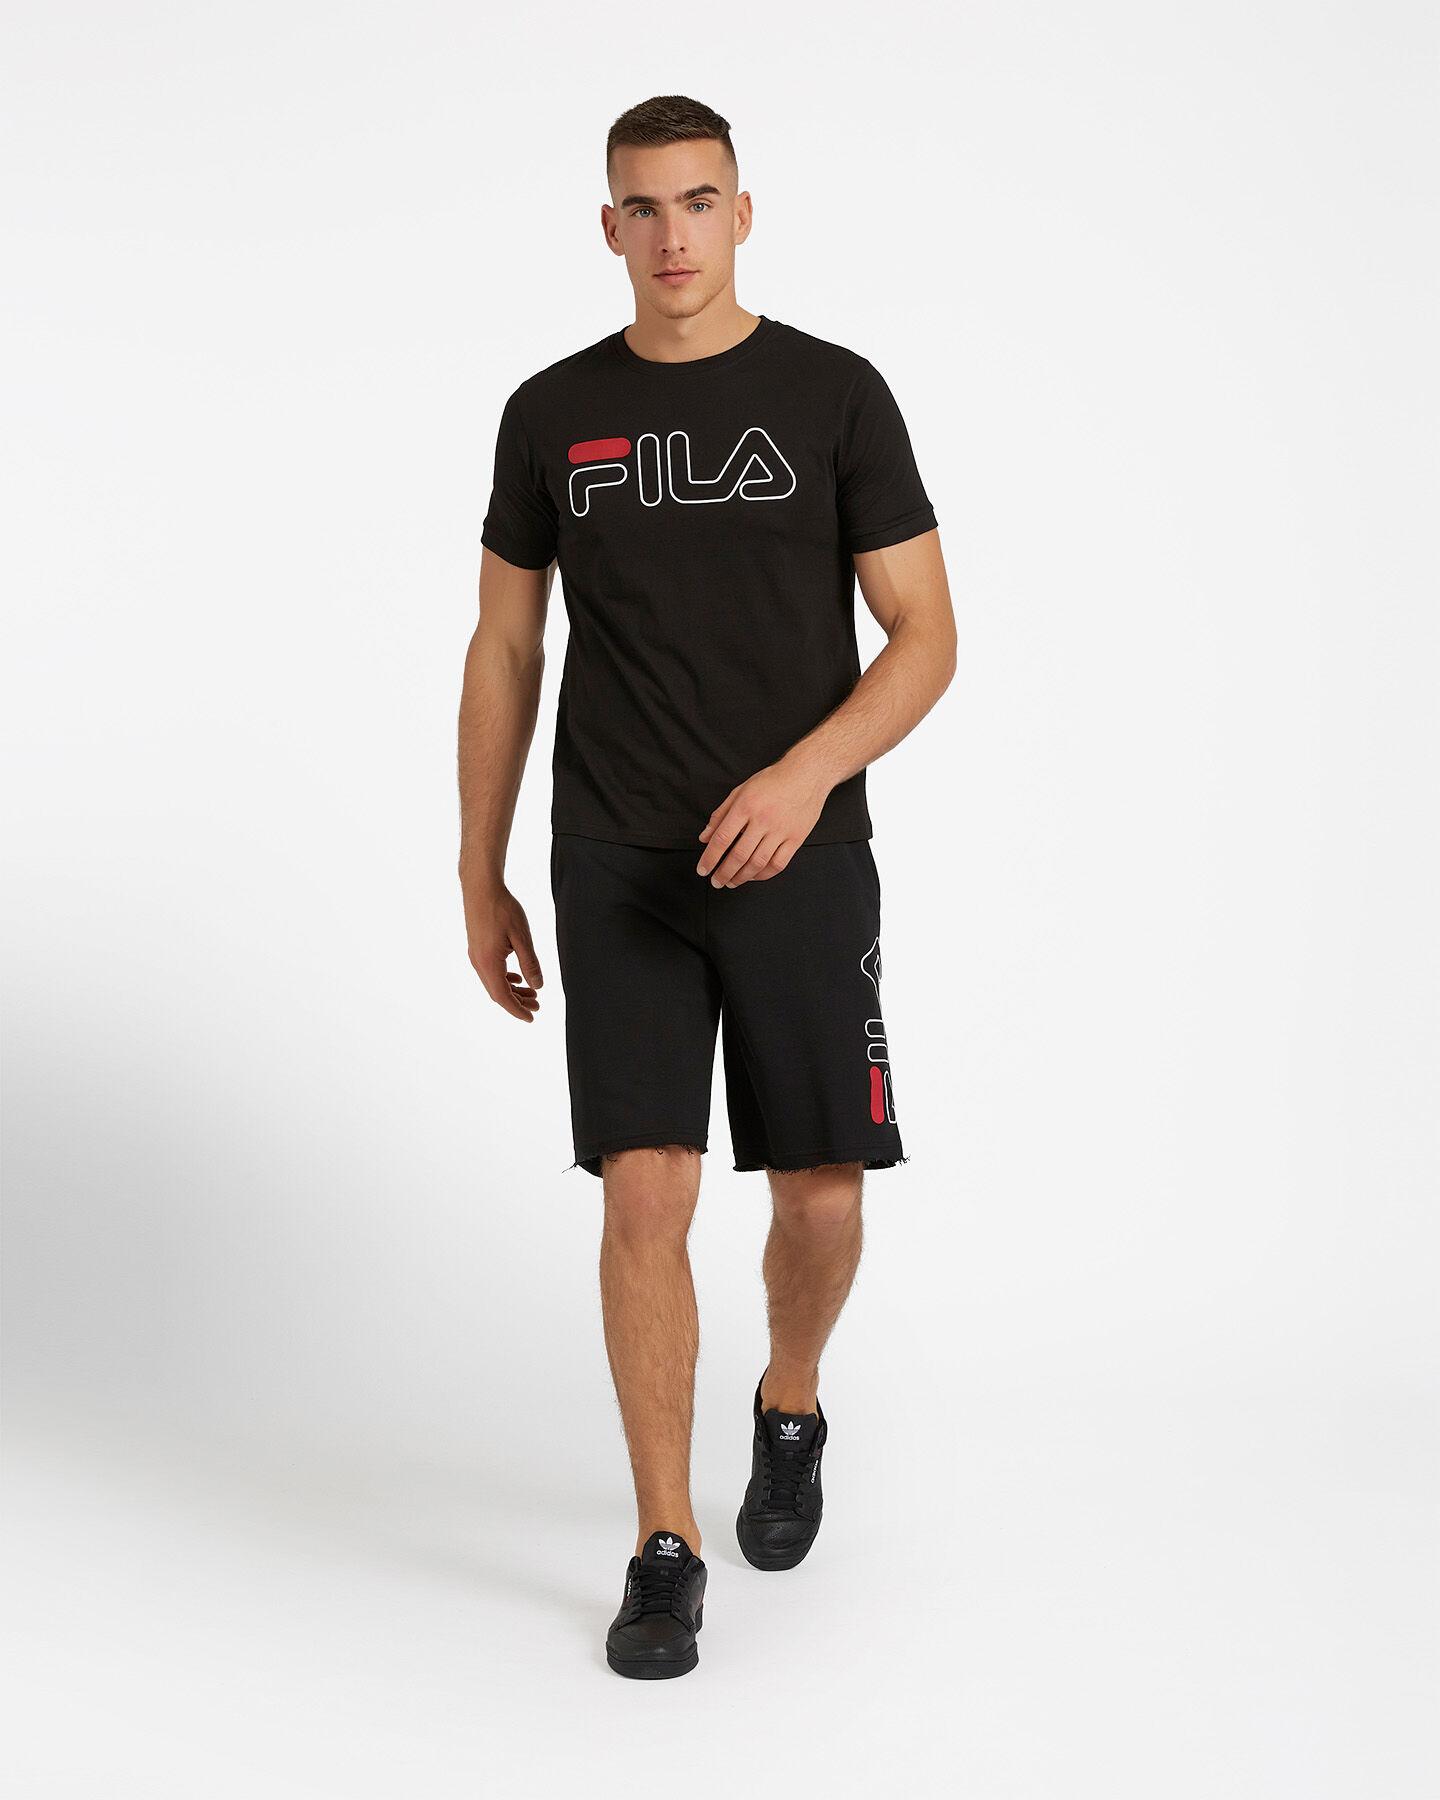 T-Shirt FILA BIG LOGO M S4067076 scatto 3